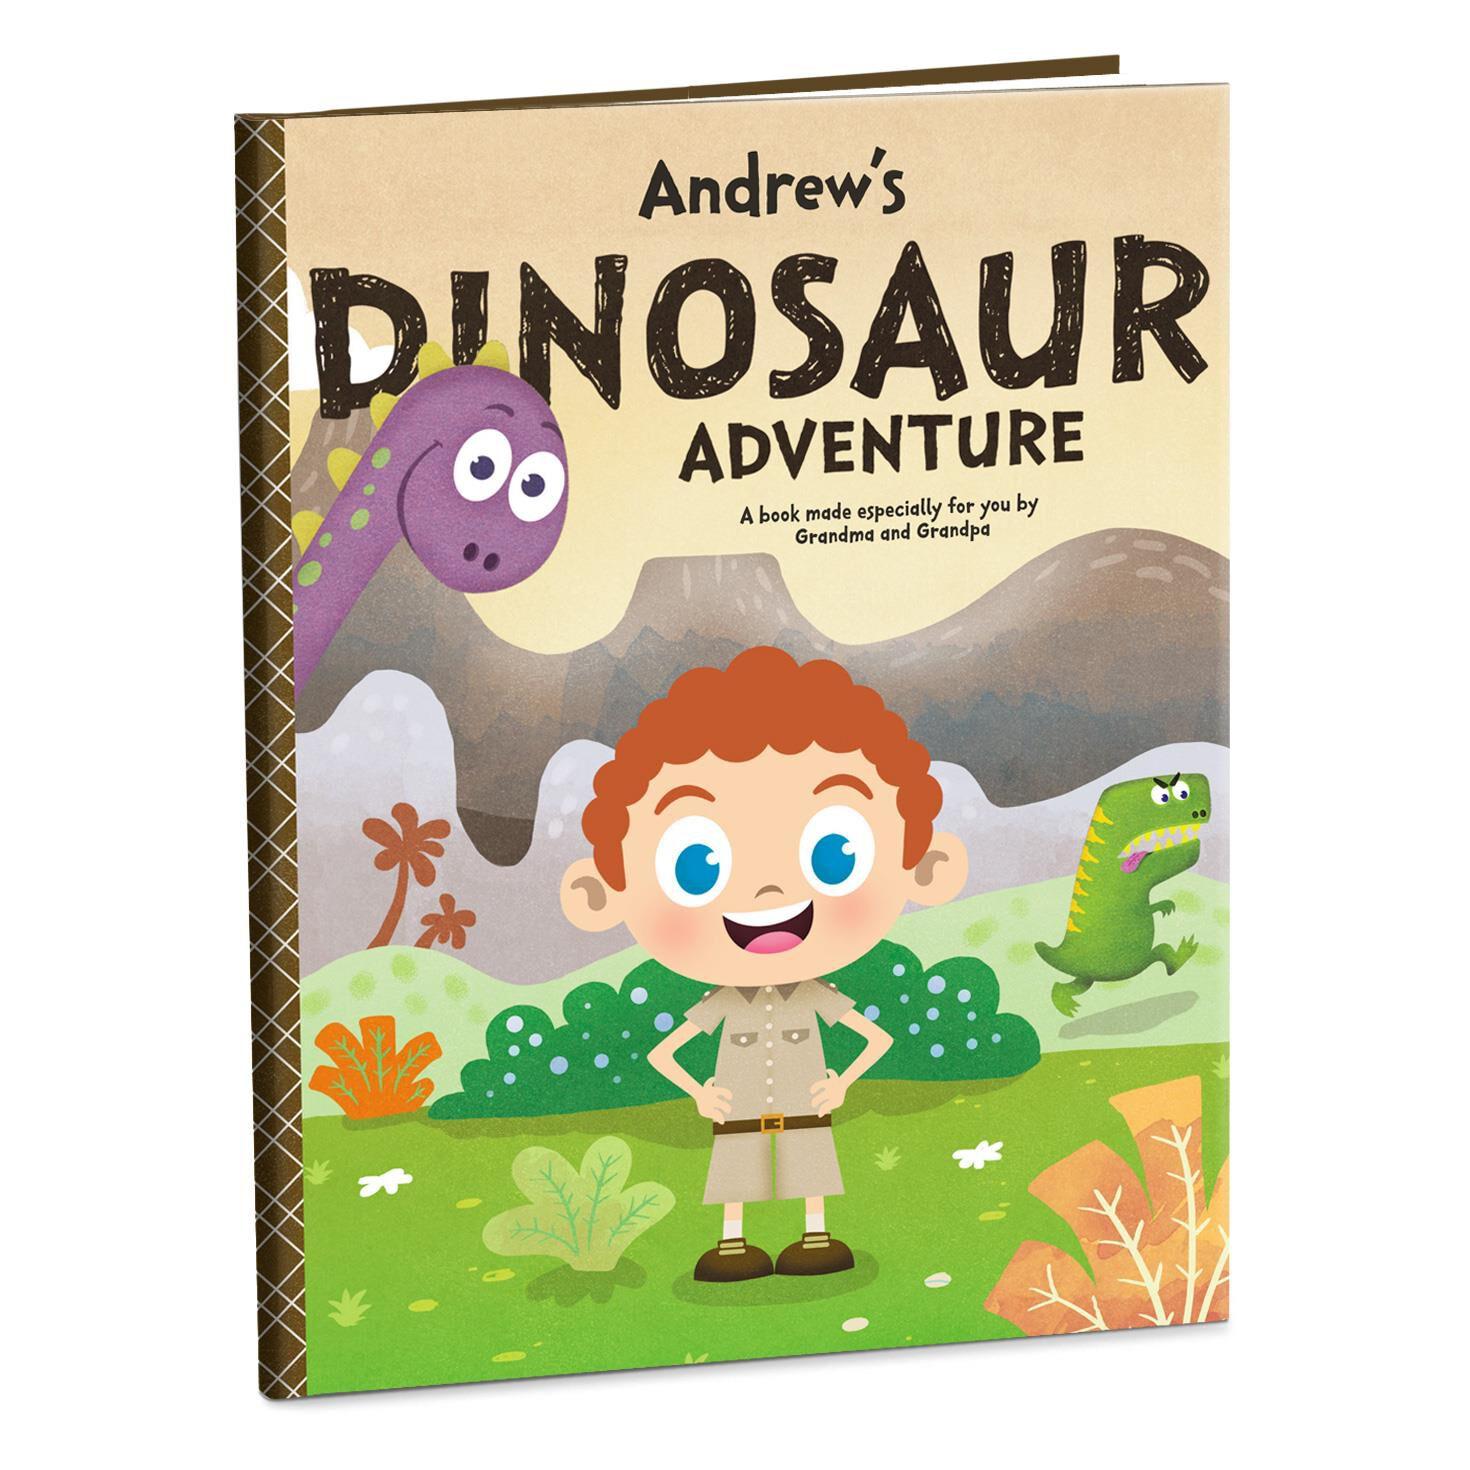 Dinosaur Adventure Personalized Book Personalized Books